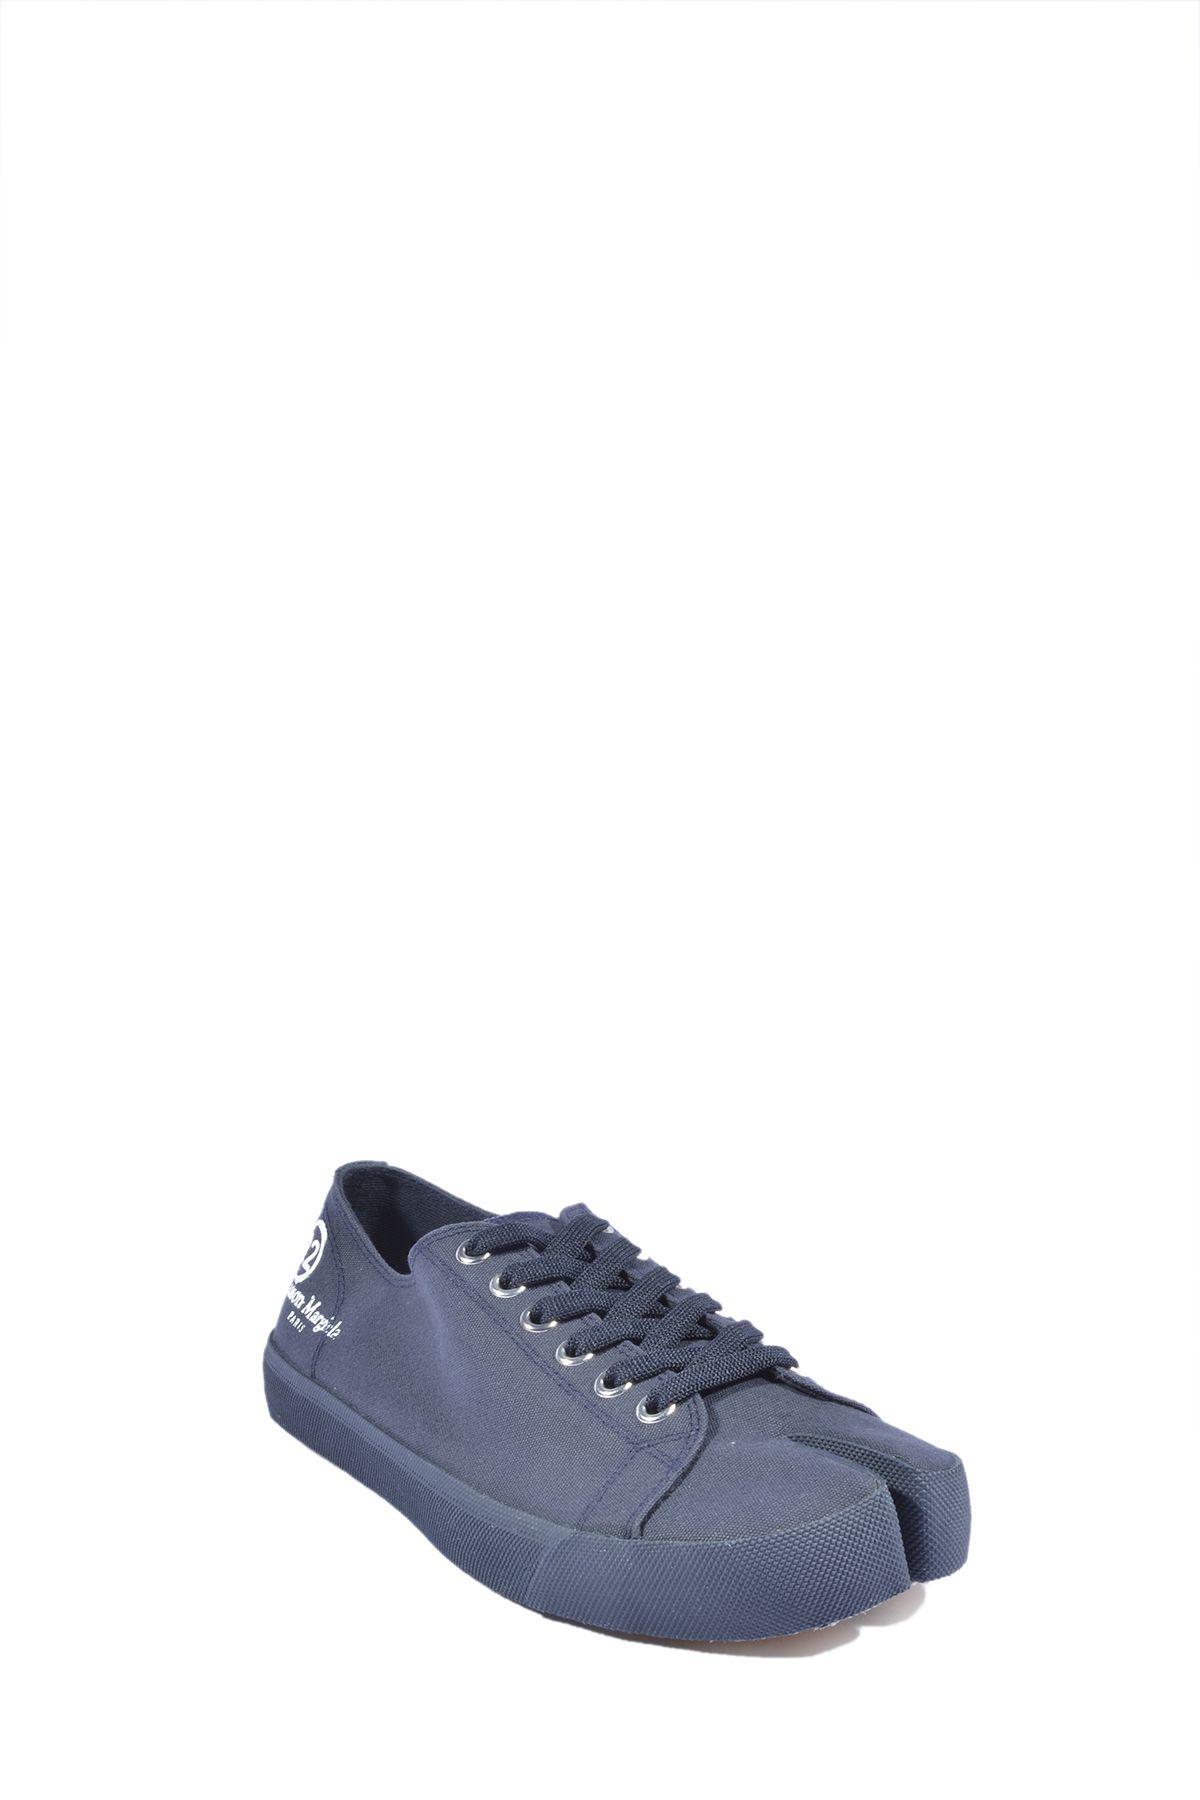 MAISON MARGIELA Sneakers MAISON MARGIELA MEN'S BLUE FABRIC SNEAKERS